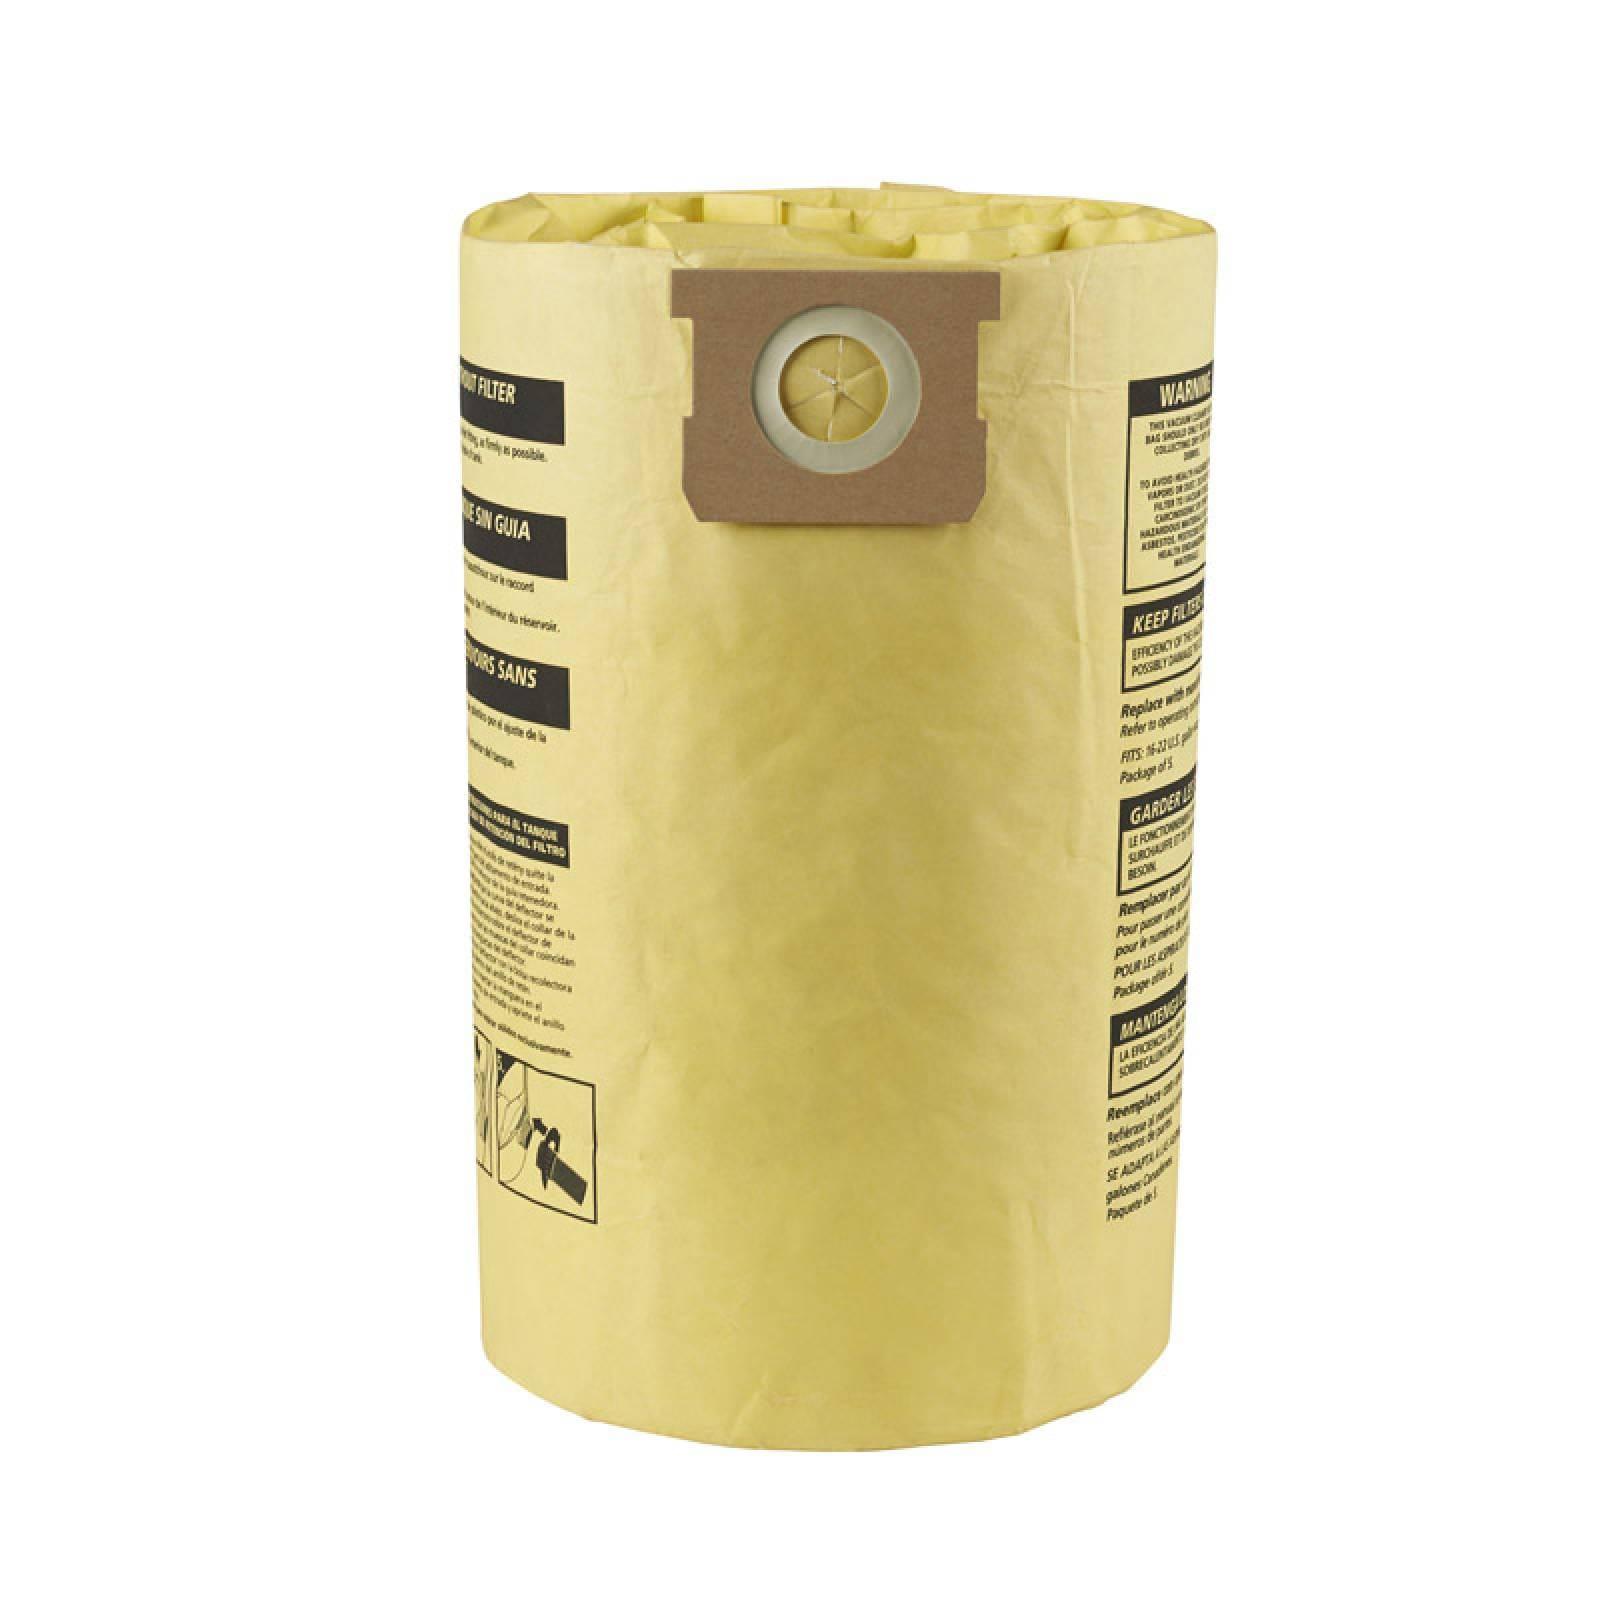 Bolsa Alta Eficiencia DryWall Tablaroca 16-20-22 Gal 2 Pzs